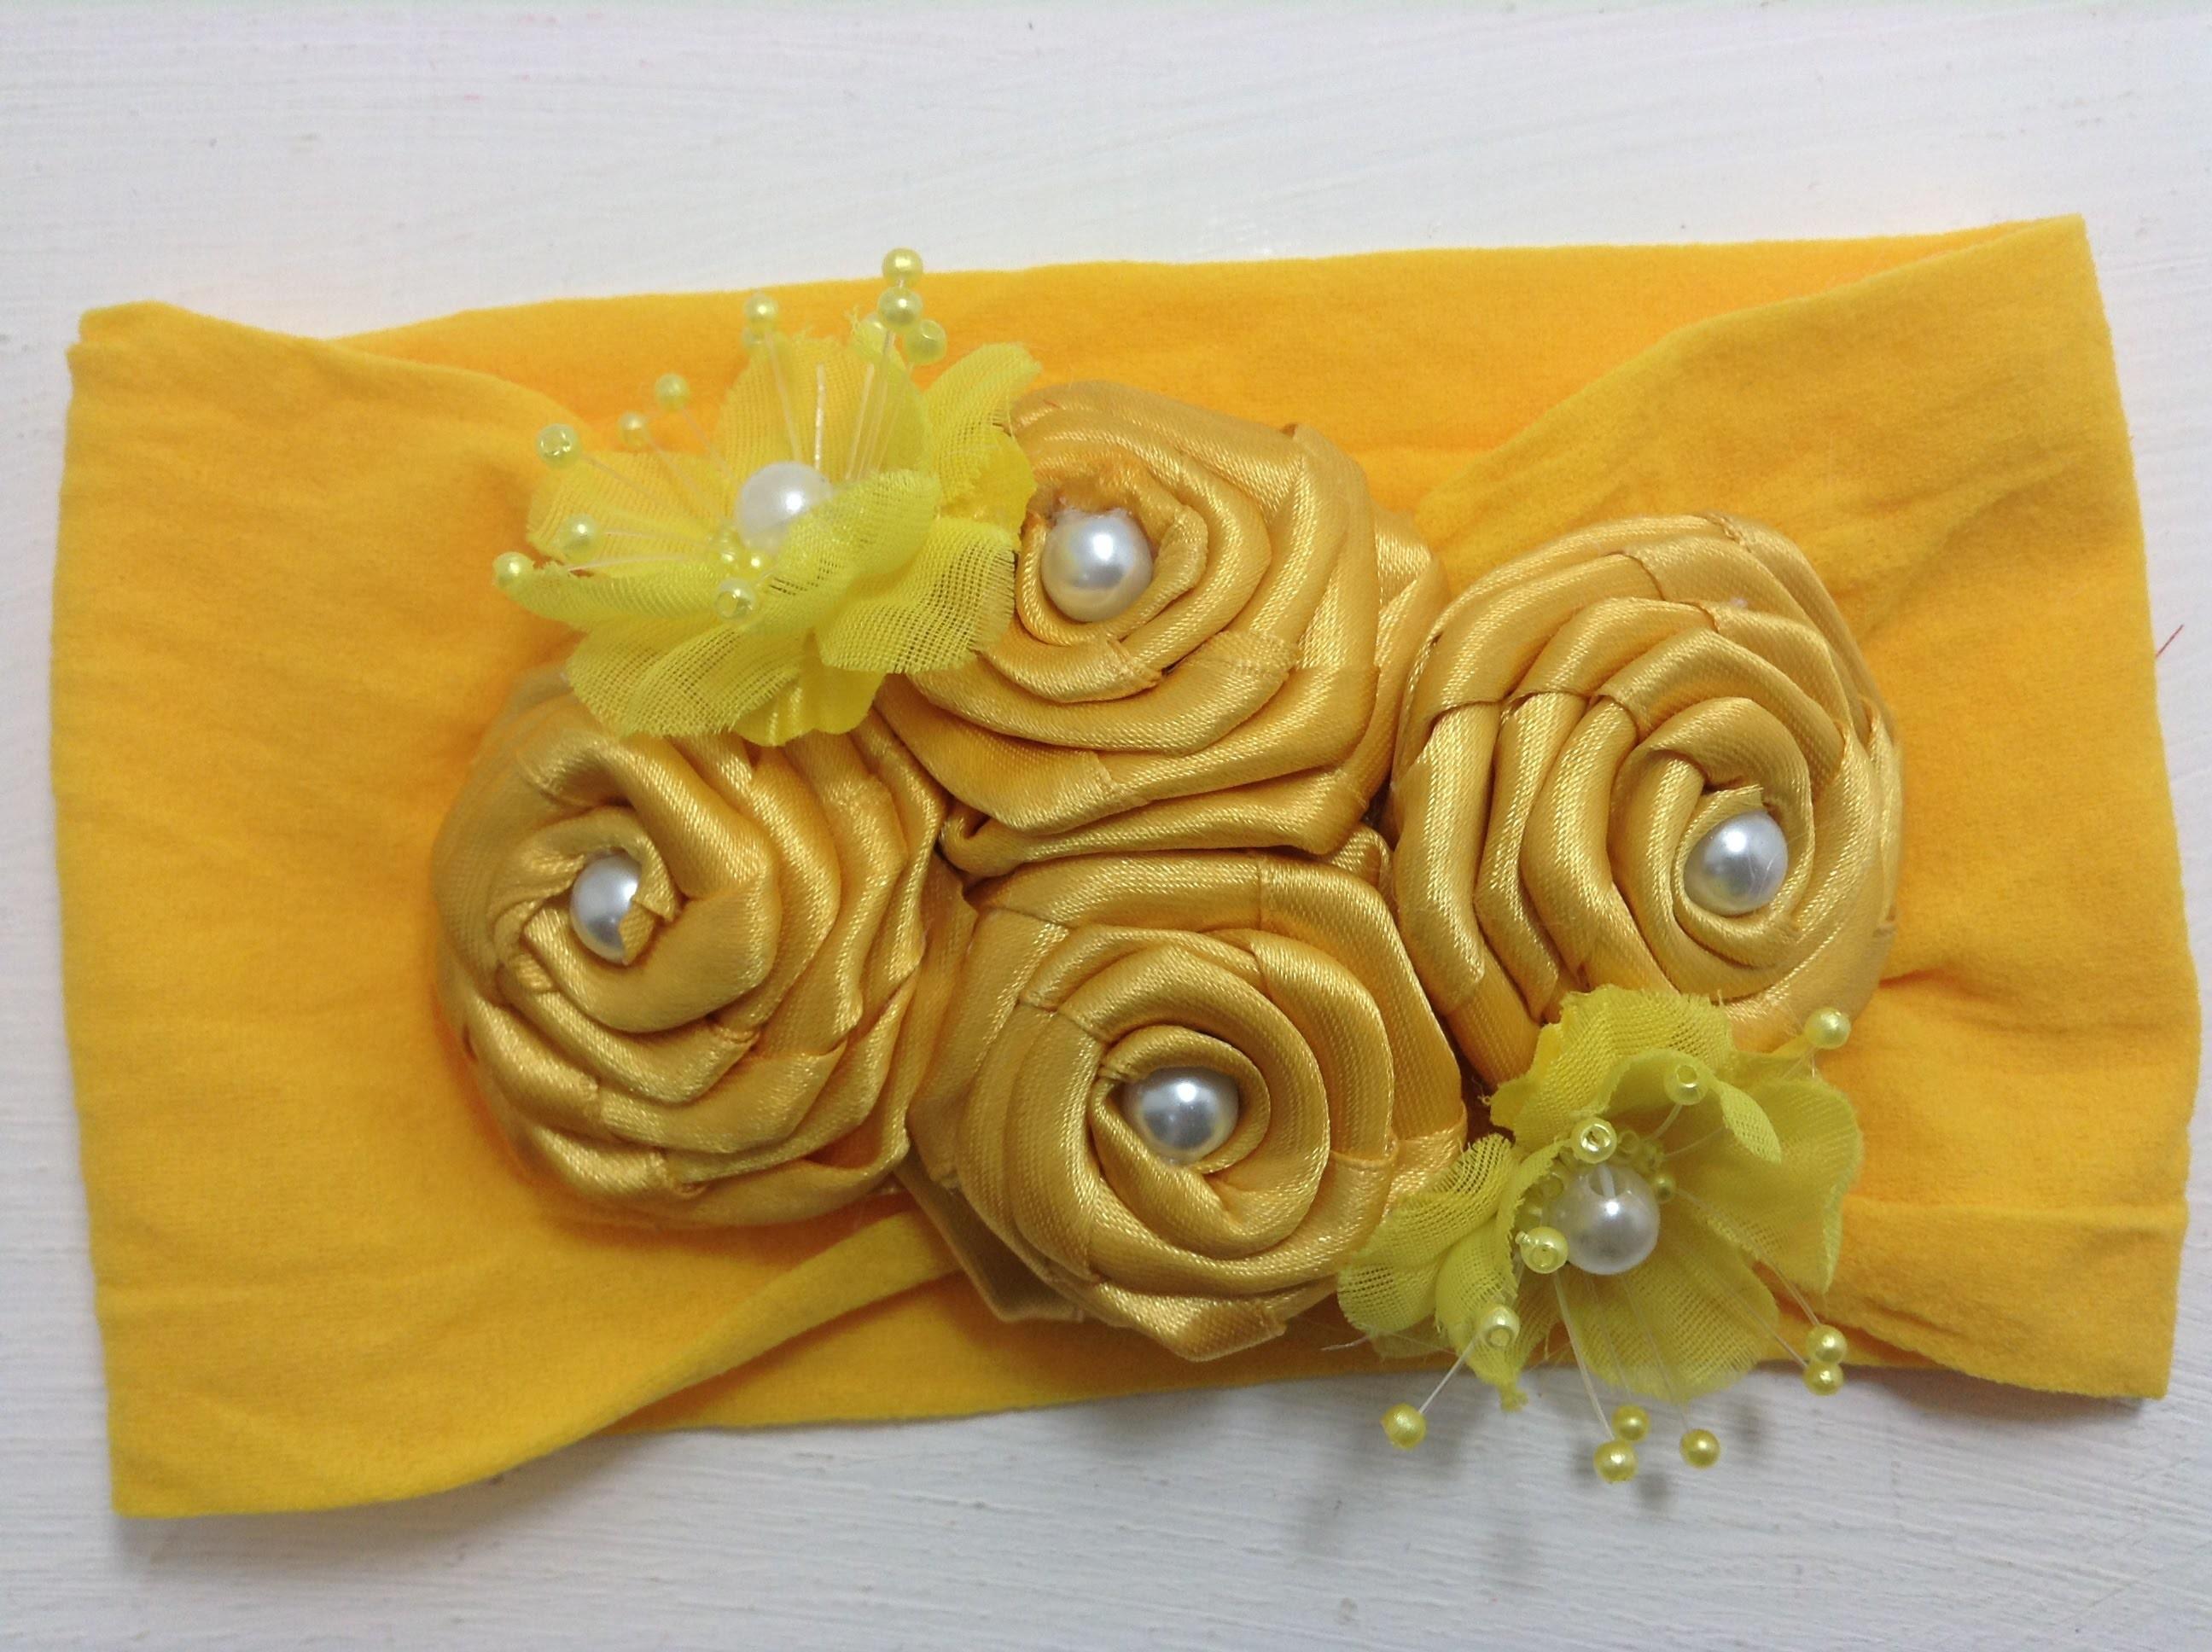 Tiara amarilla de flores de listón VIDEO No. 362